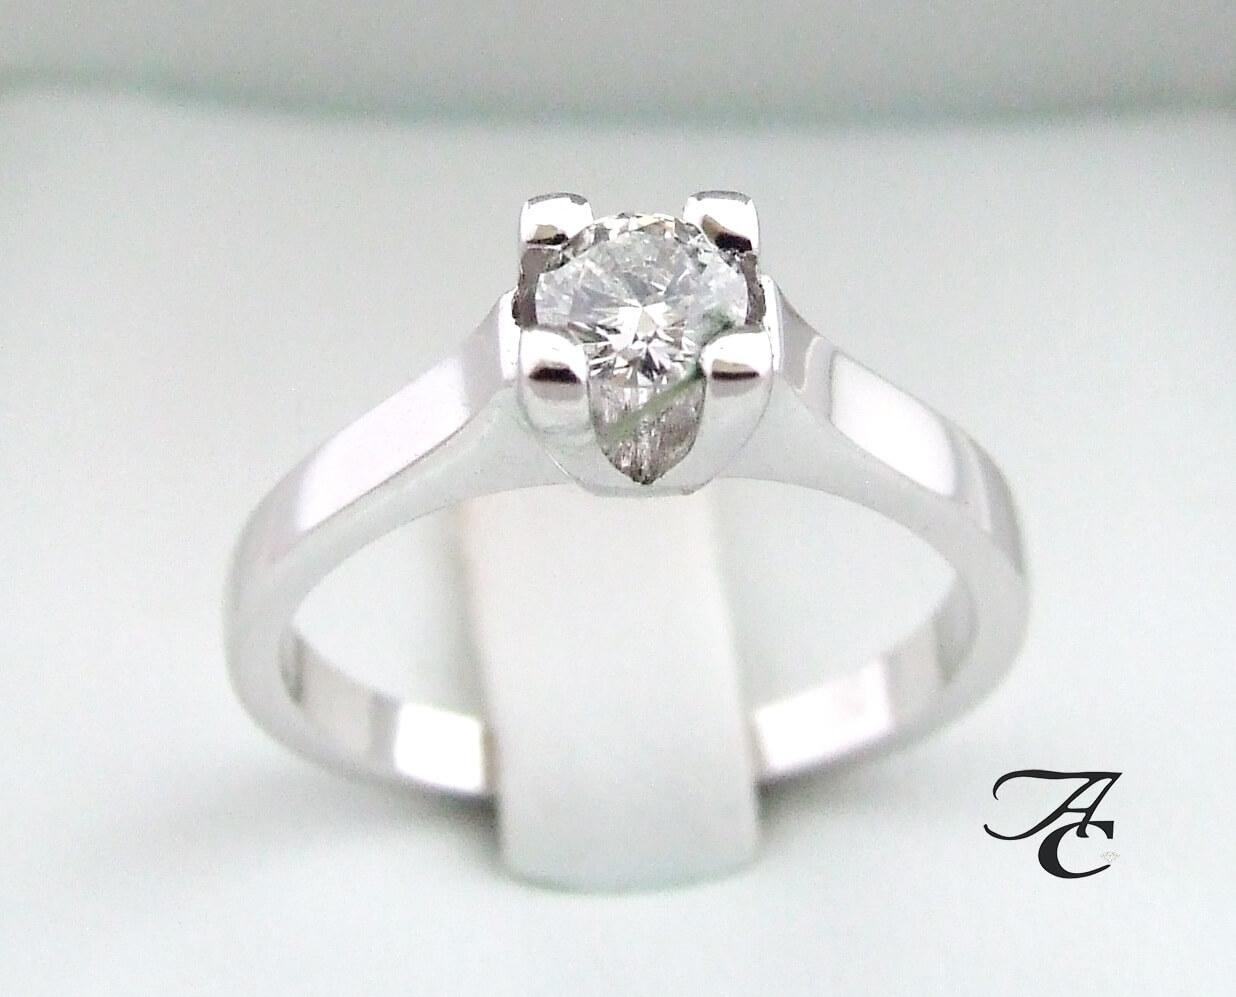 Wit gouden ring met solitair briljant